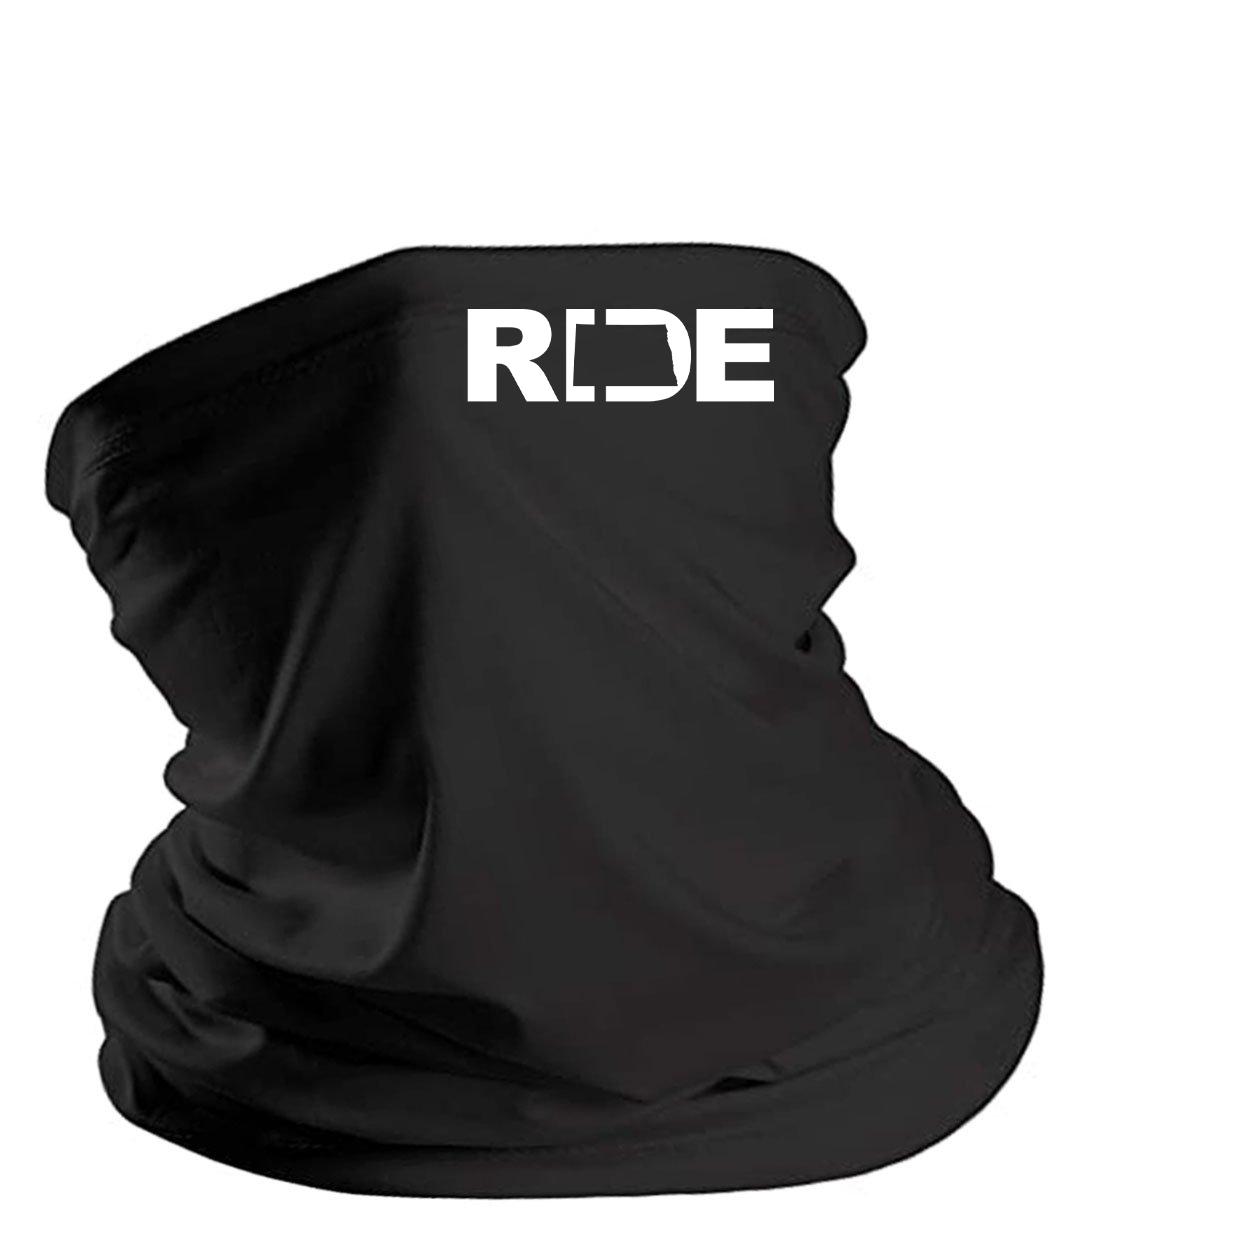 Ride North Dakota Night Out Lightweight Neck Gaiter Face Mask Black (White Logo)